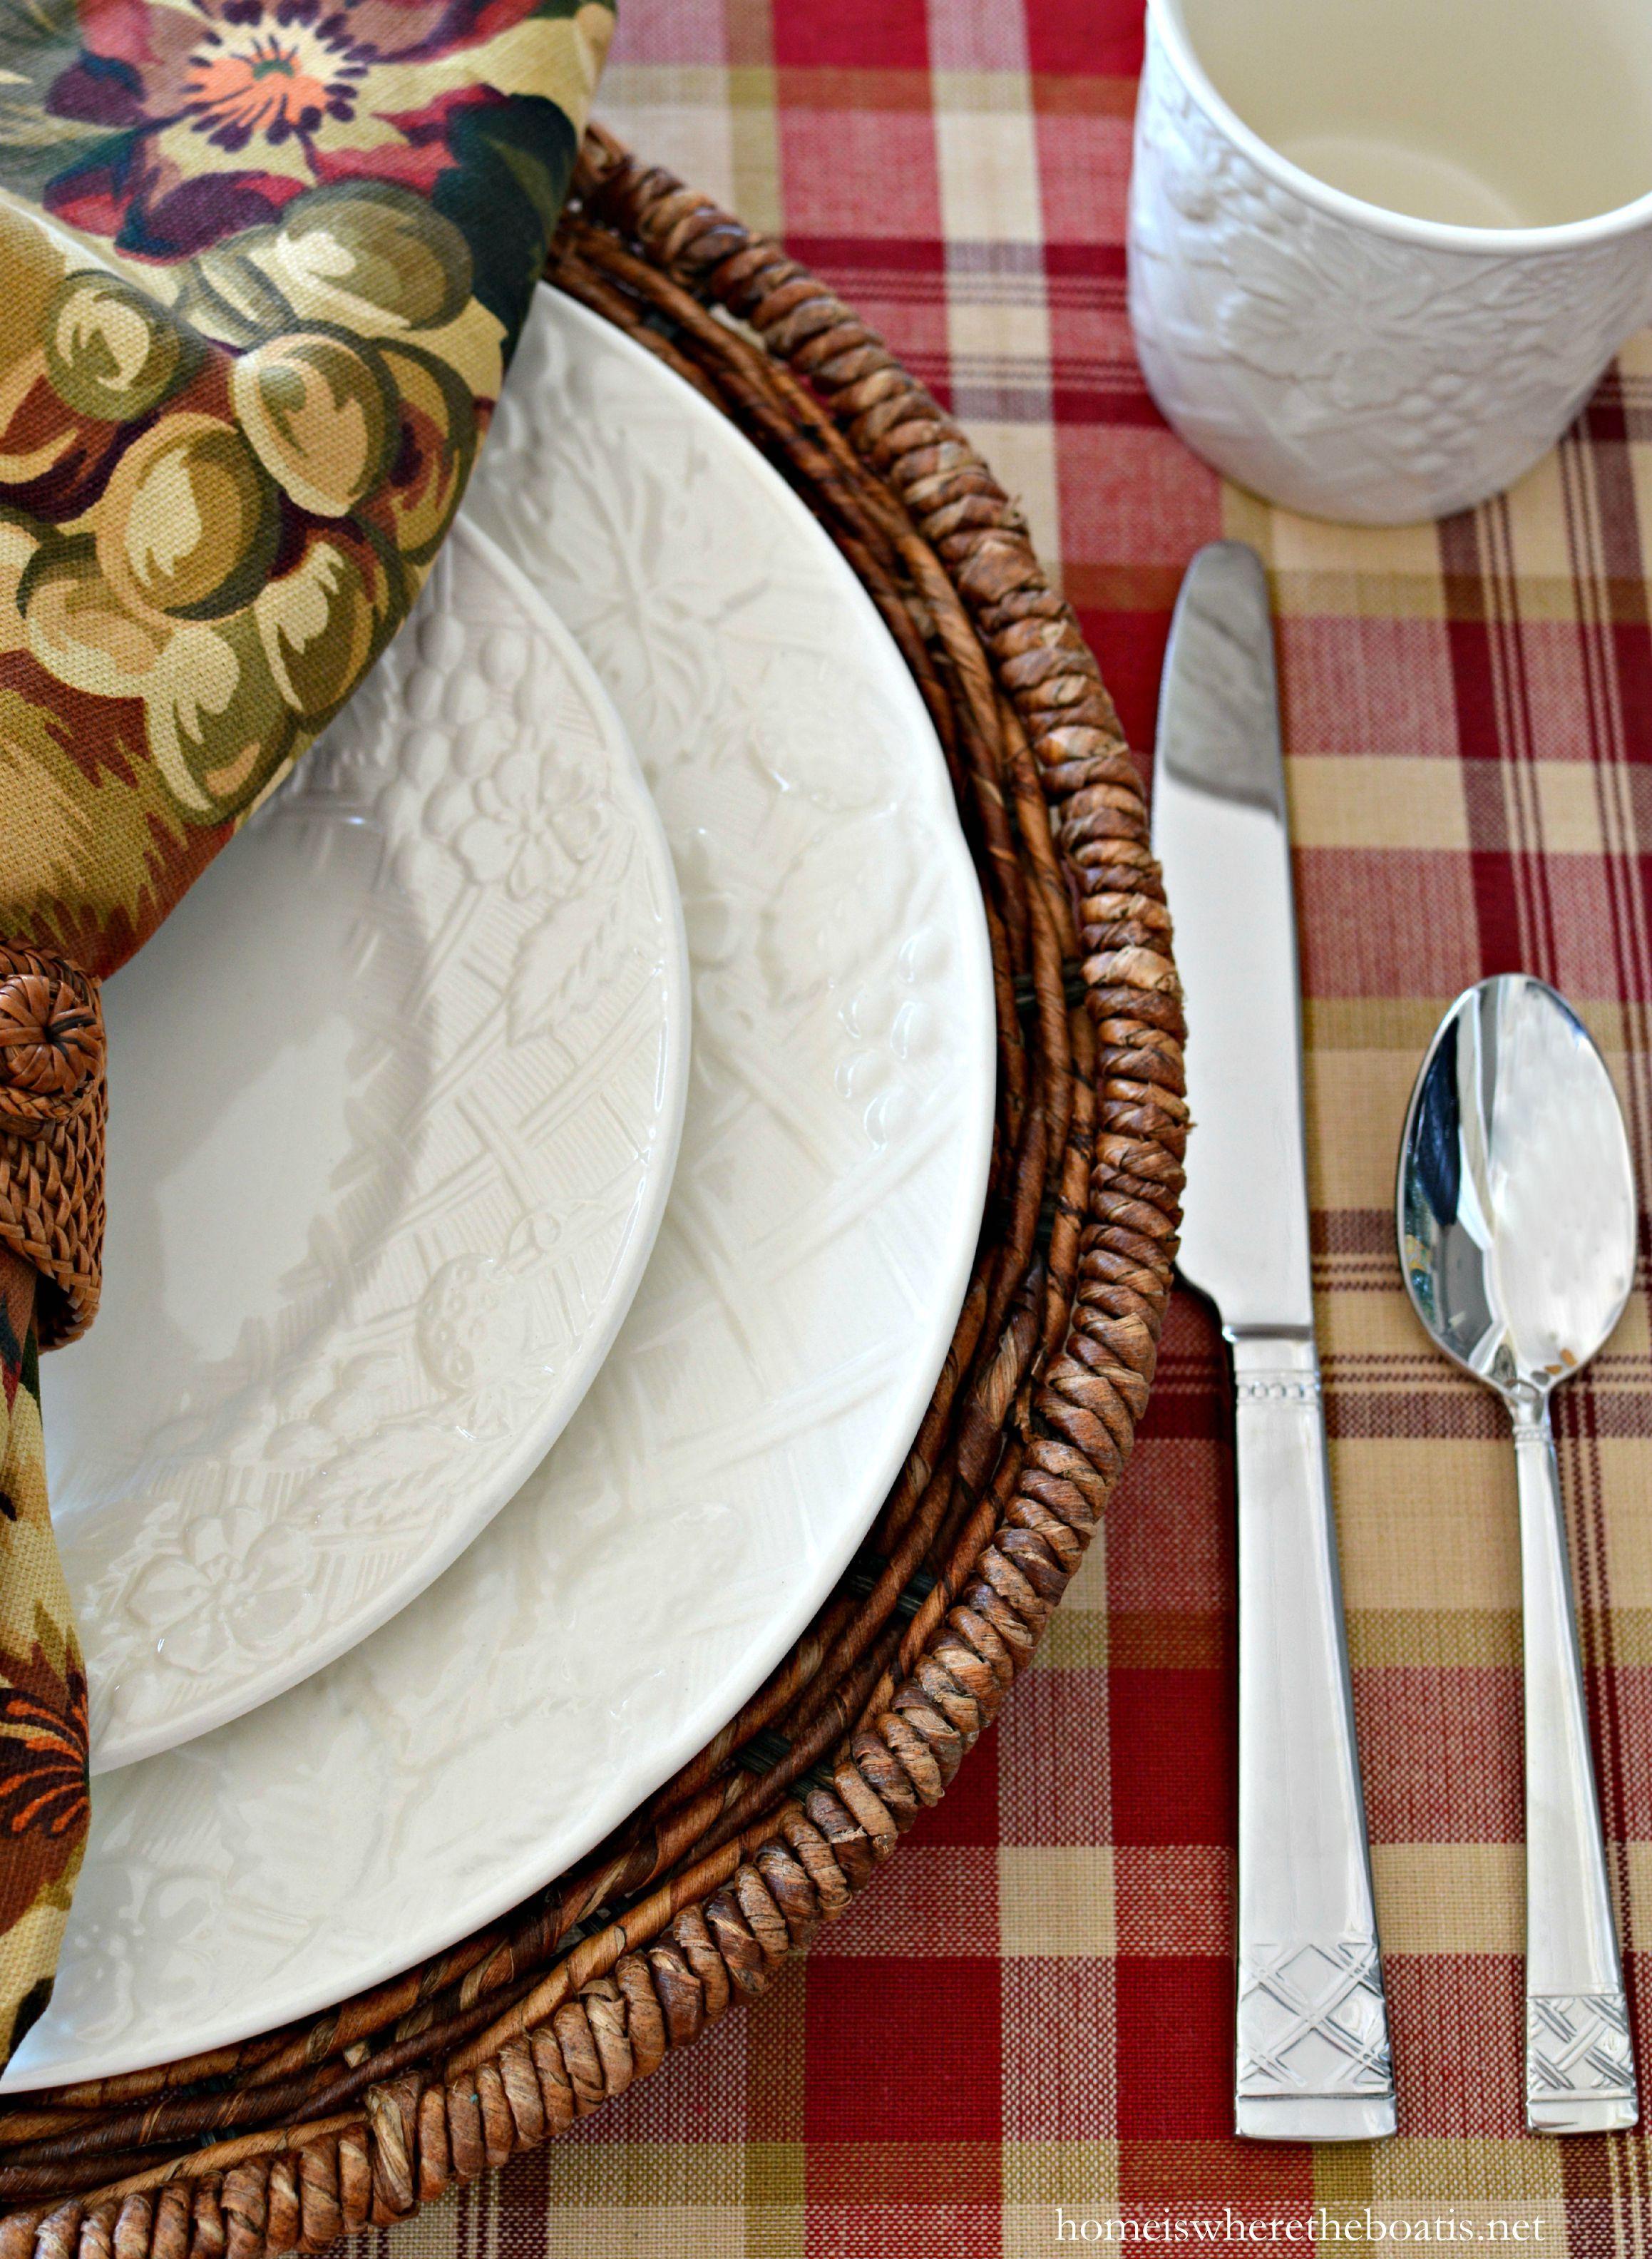 Mikasa English Countryside Dinnerware | homeiswheretheboatis.net #tablescape & Mikasa English Countryside Dinnerware | homeiswheretheboatis.net ...